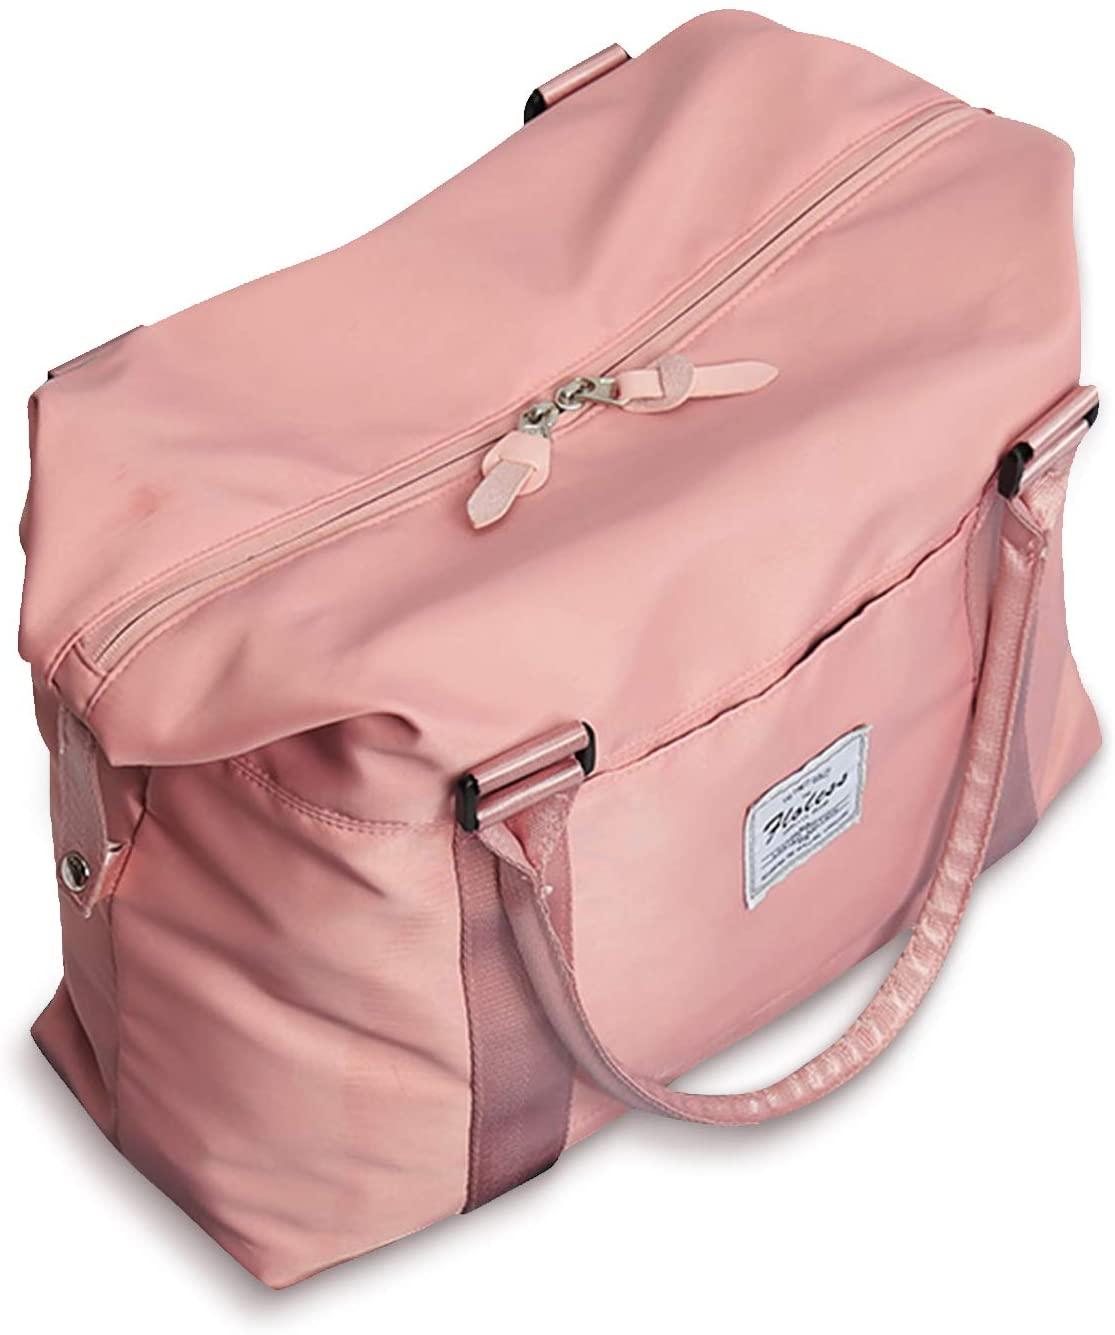 workout duffel bag